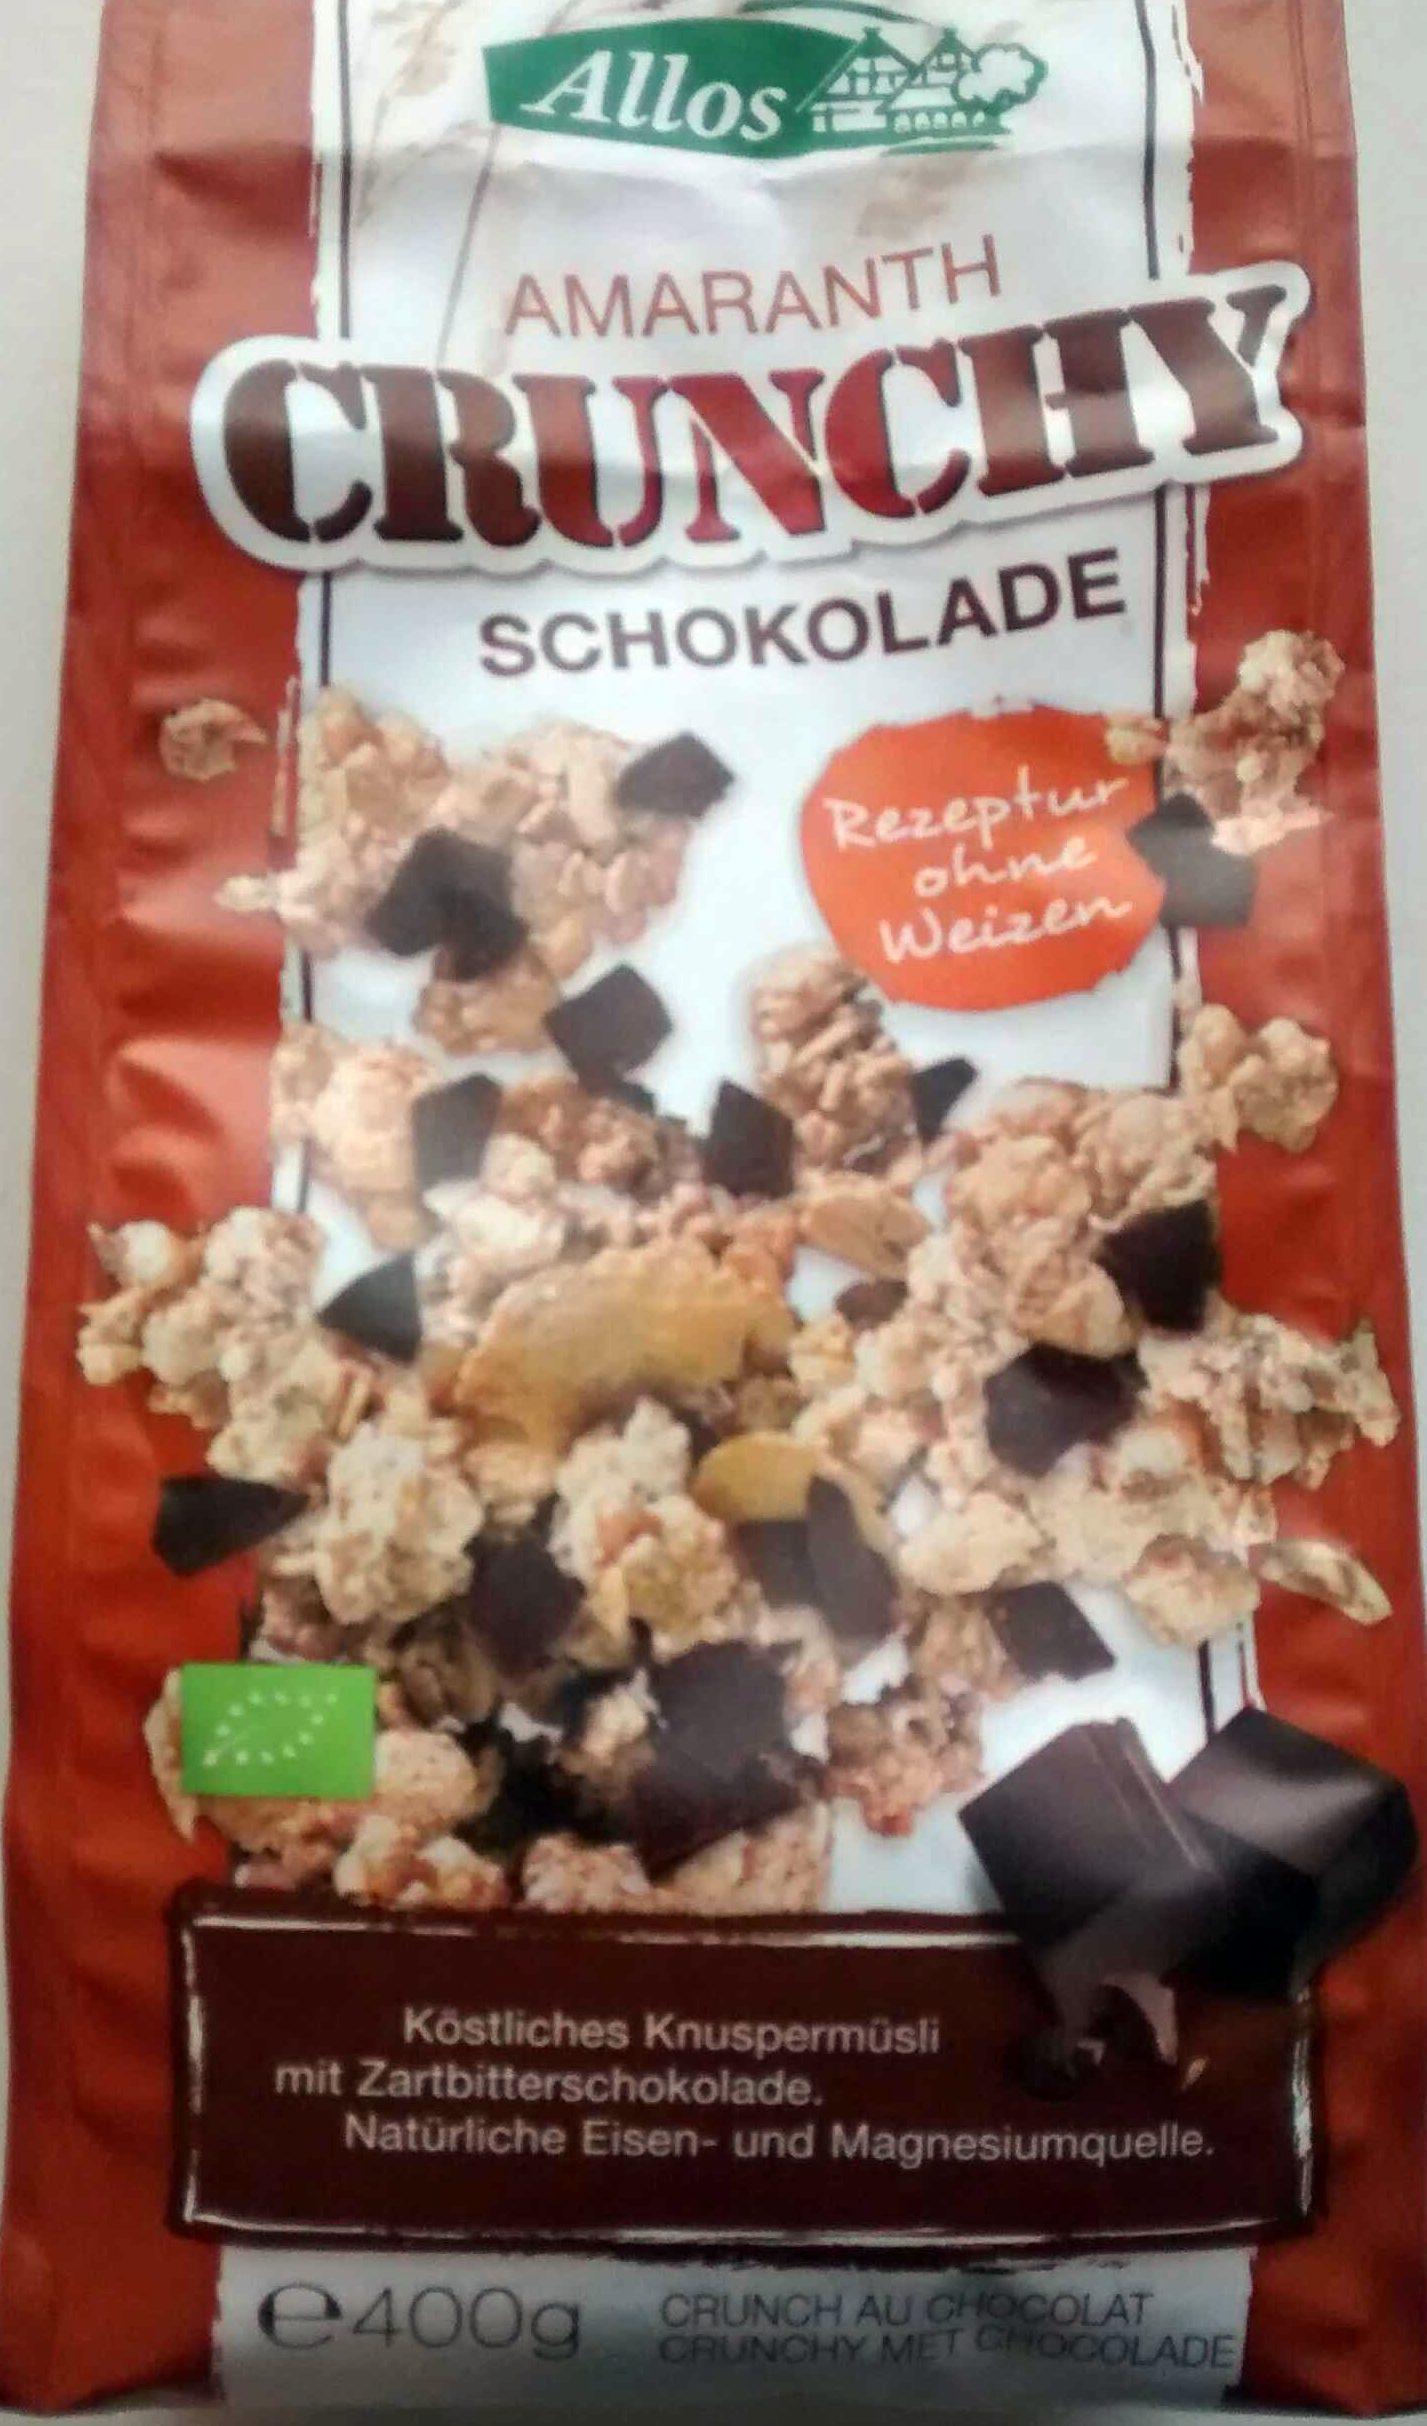 Amaranth crunchy schokolade - Product